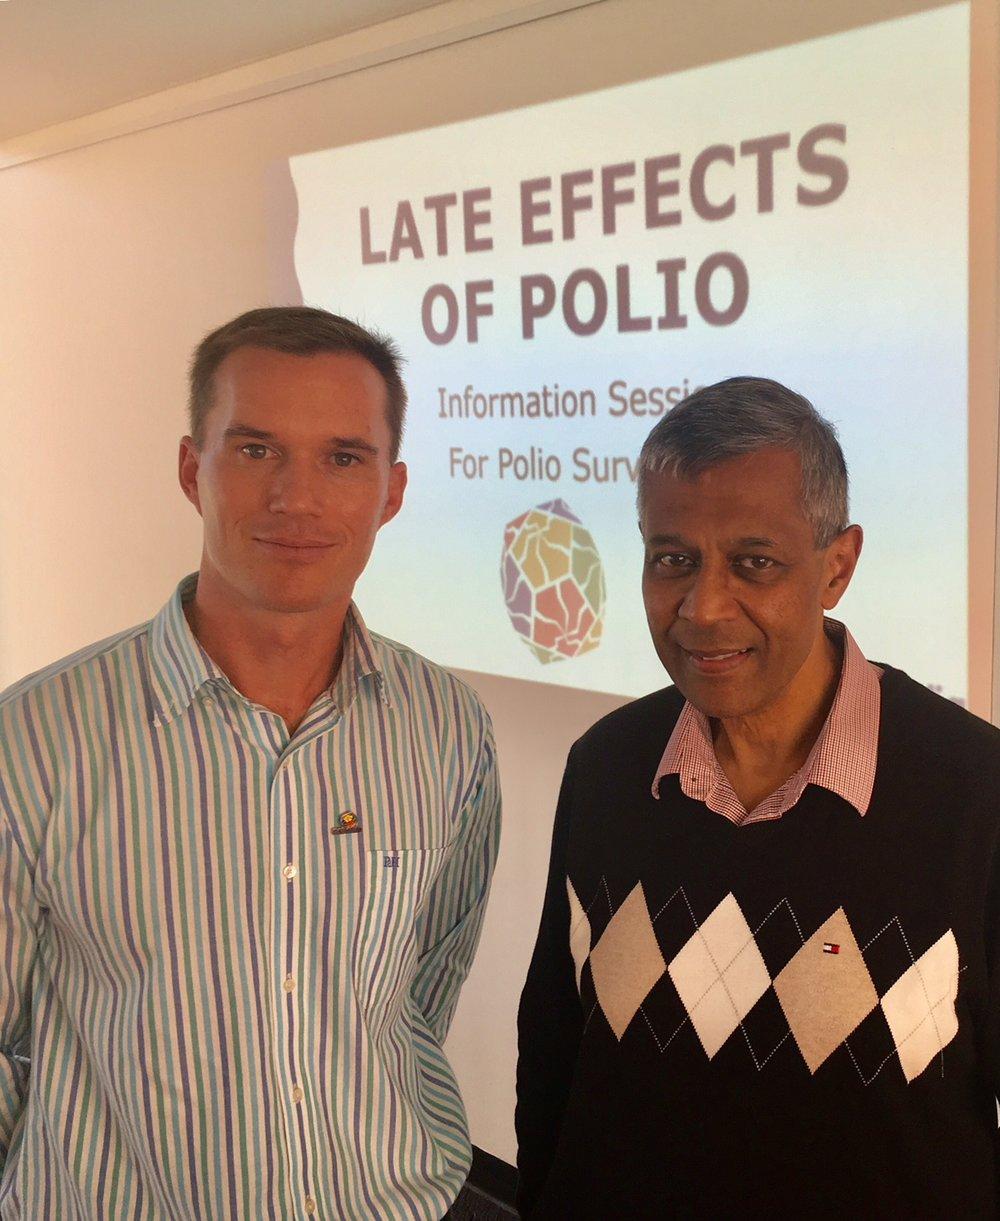 Image of Paul Cavendish & Dr Quadros at a Polio survivor information session